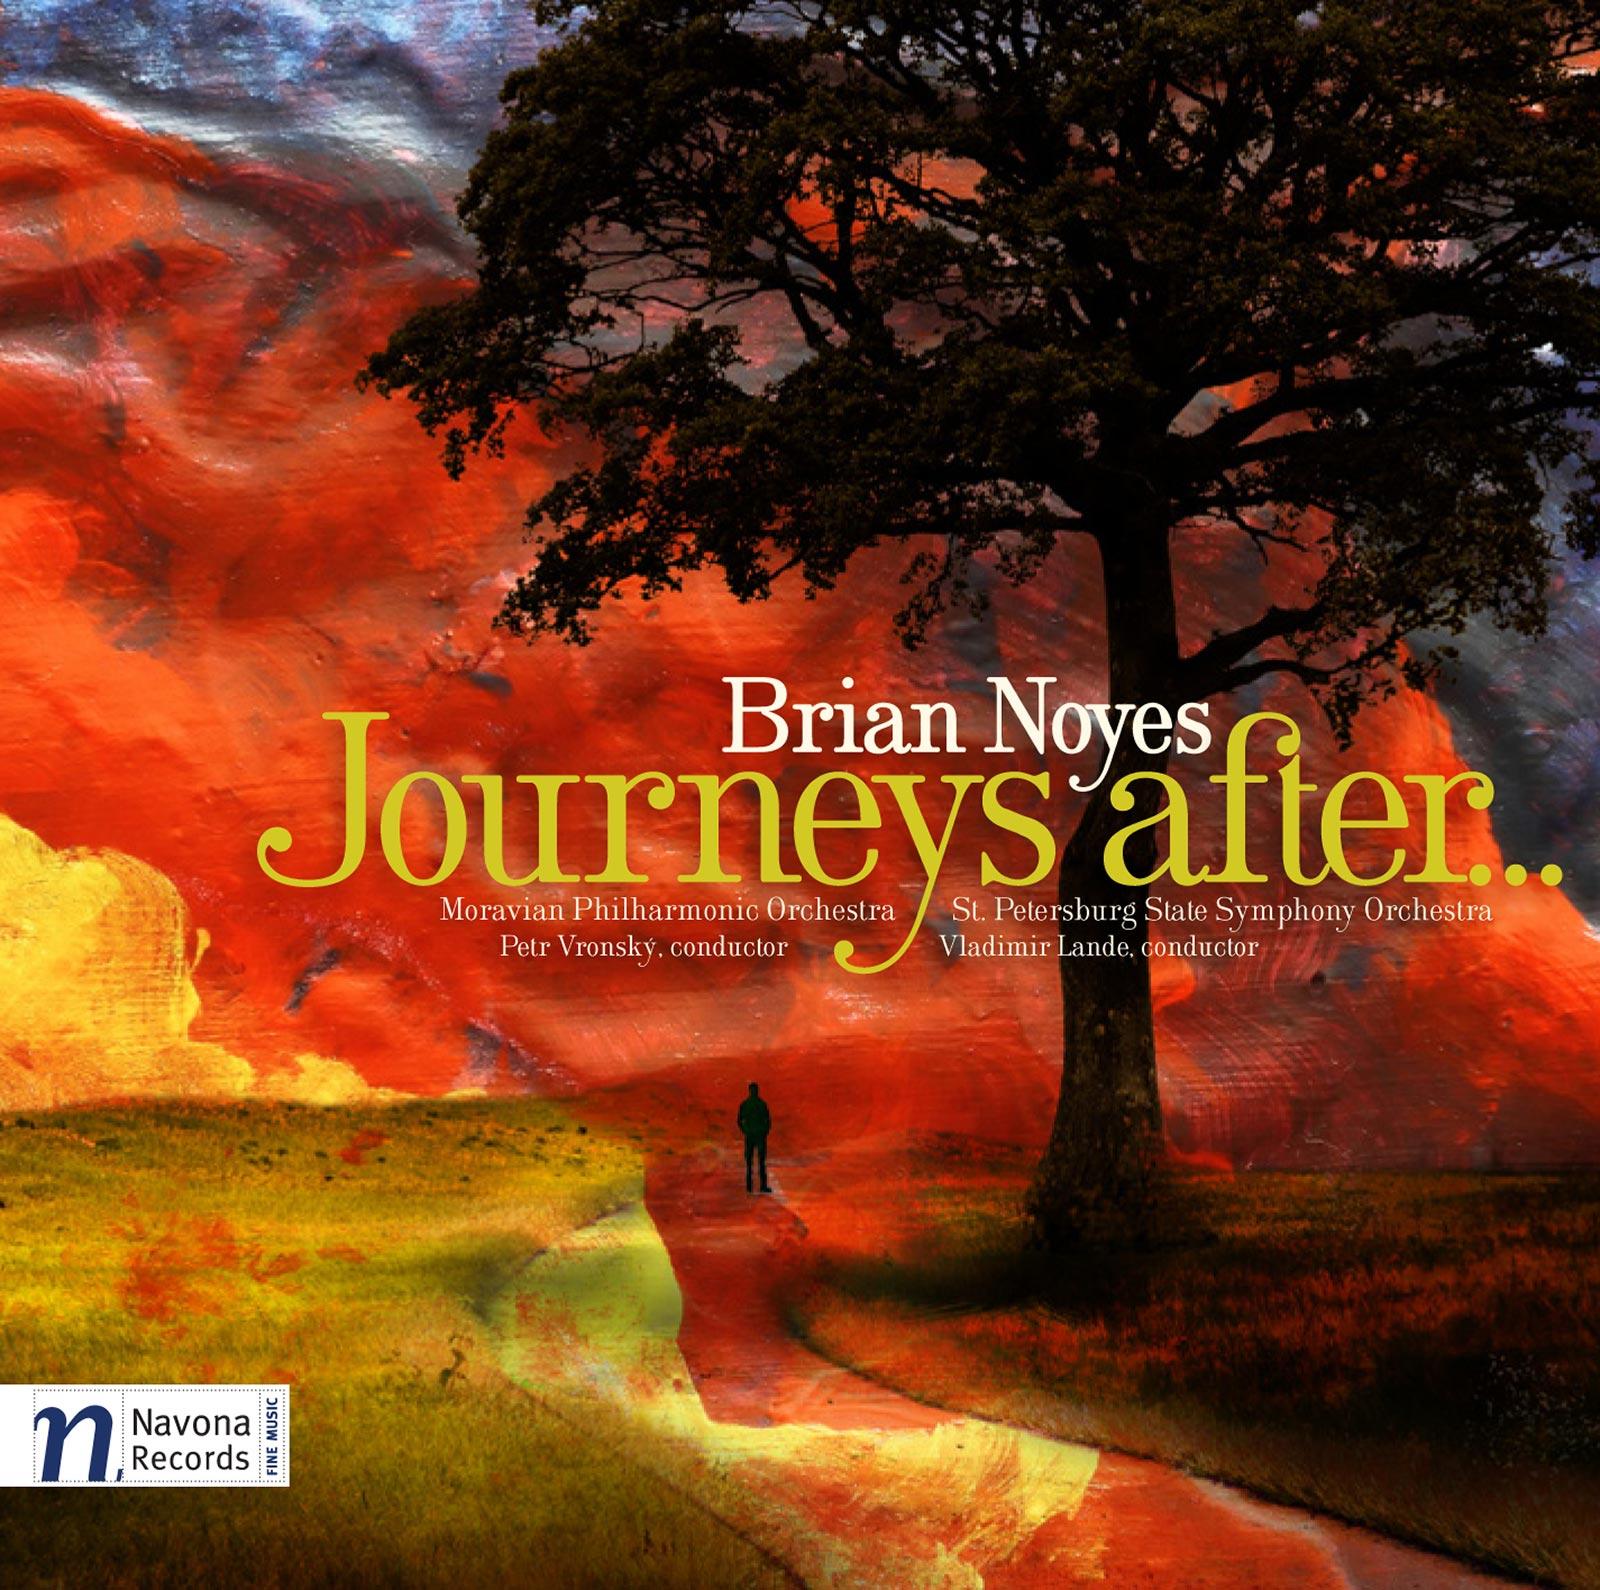 Journeys after …